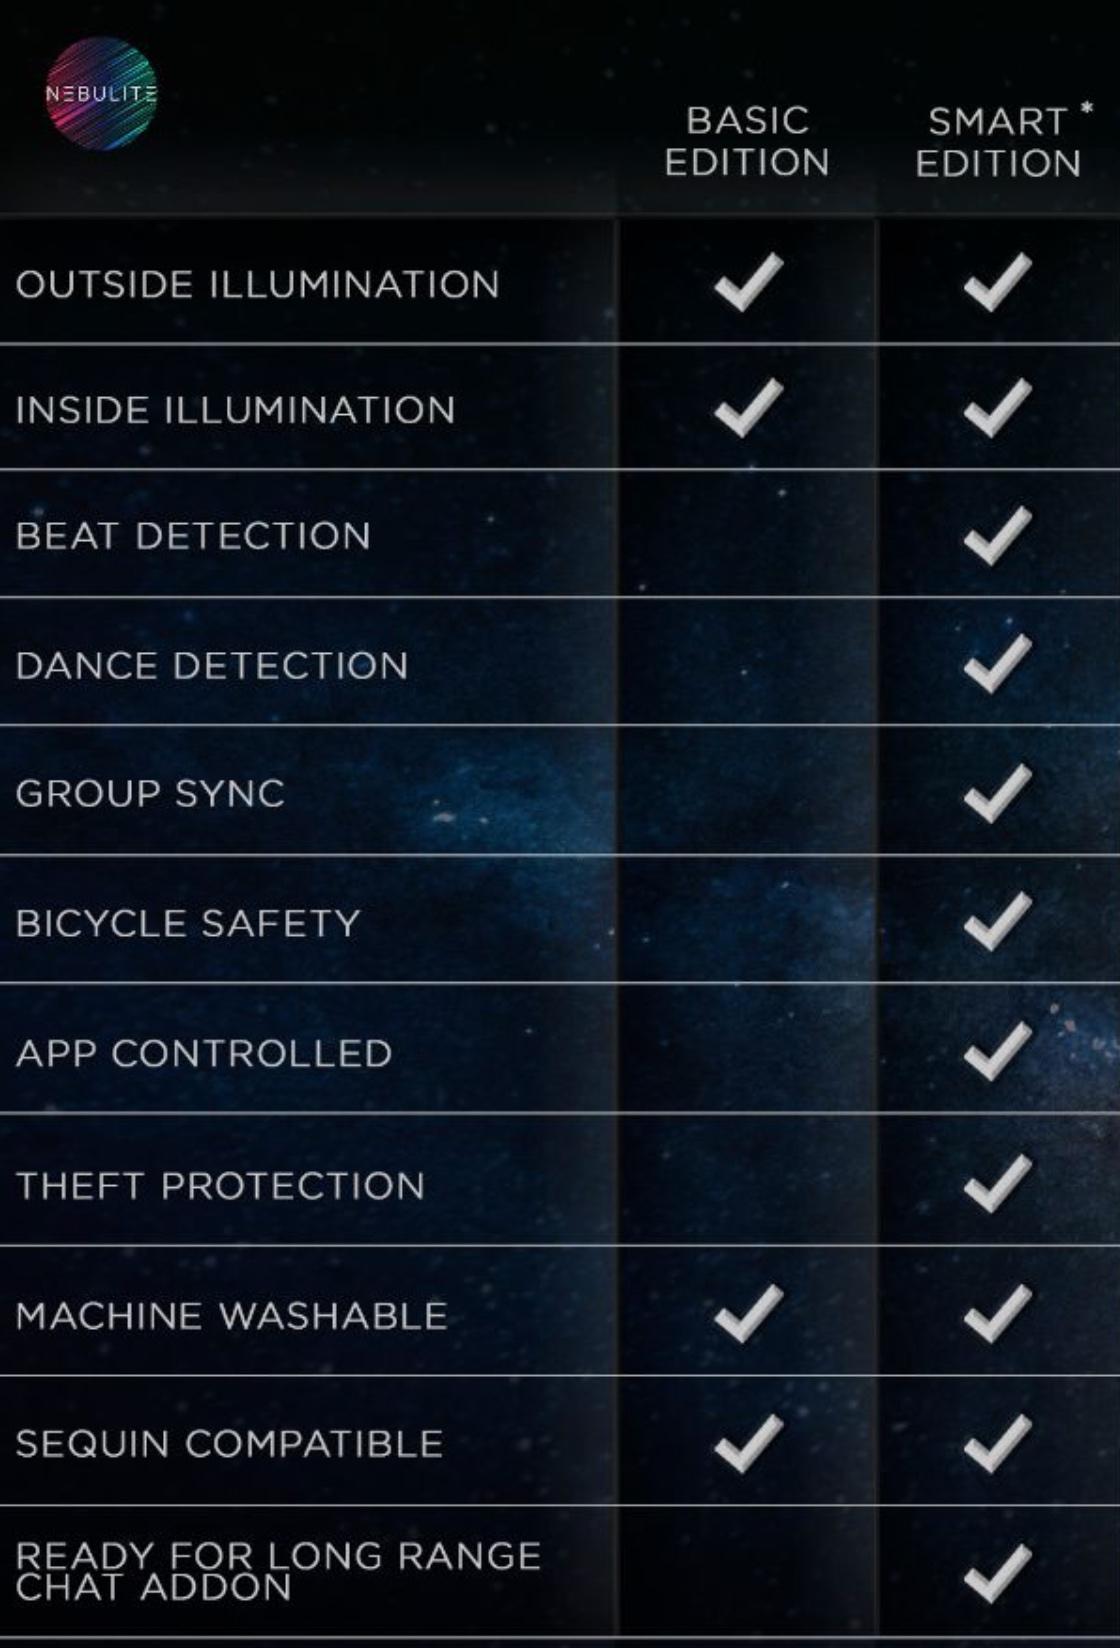 Trancebag Nebulite Basic Smart edition chart